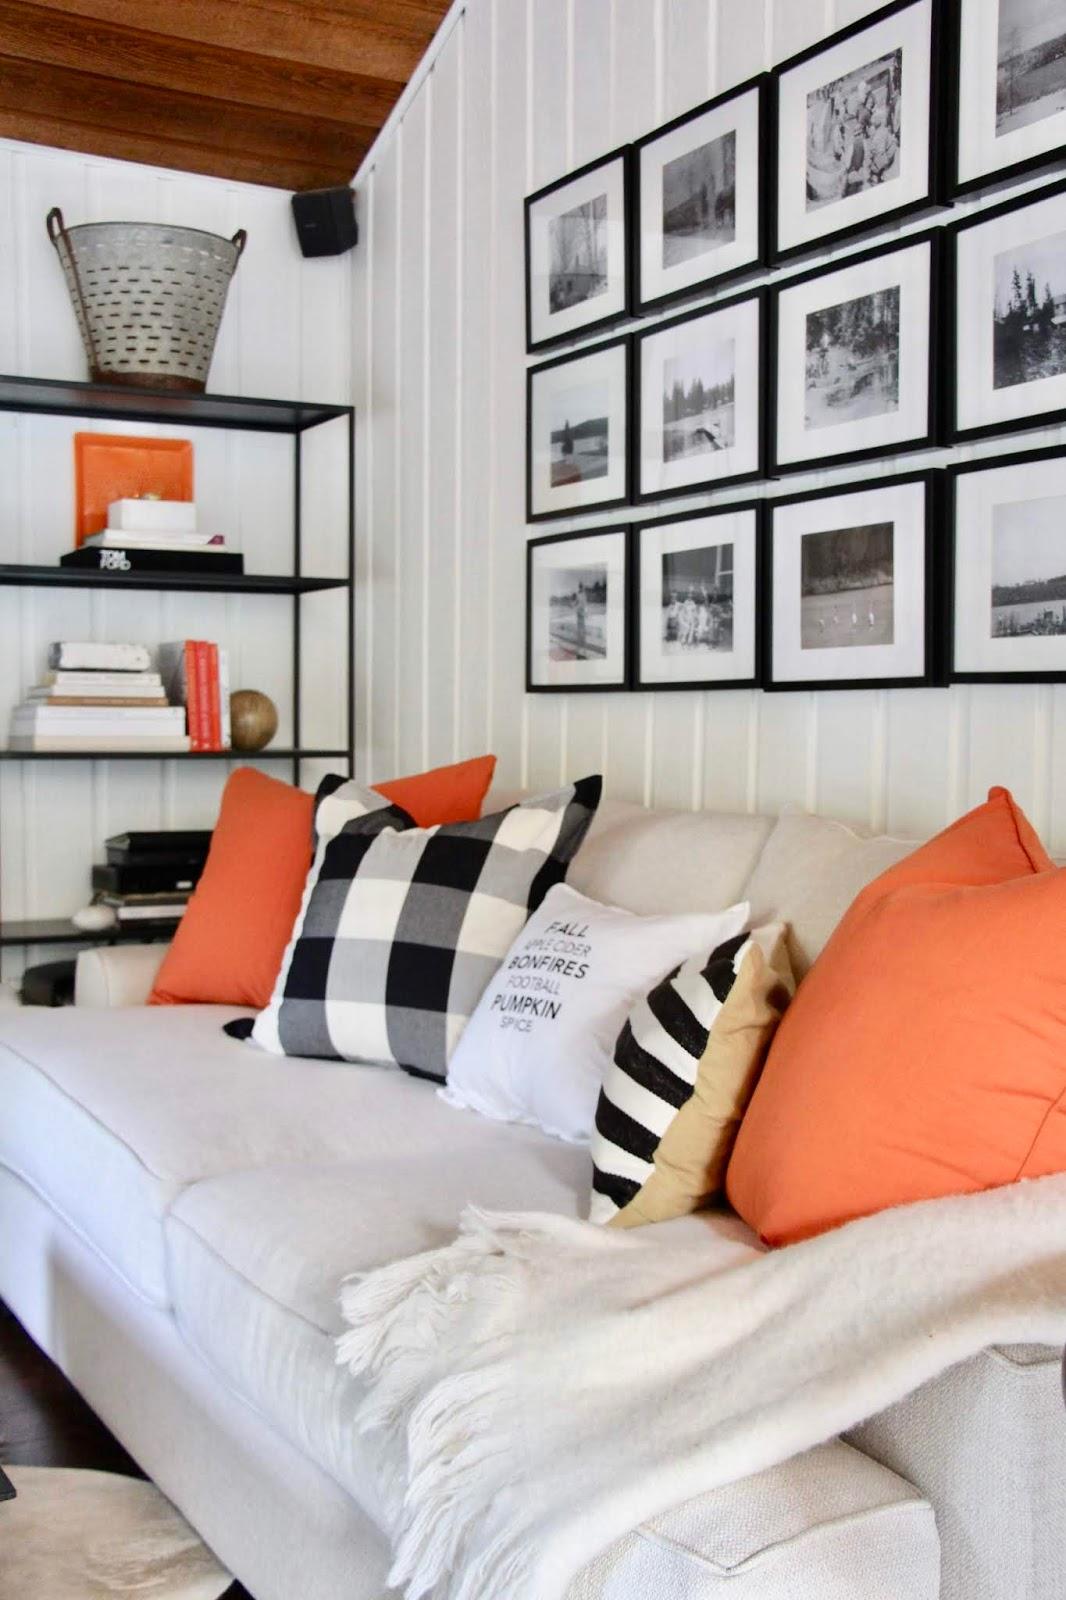 My Sweet Savannah: ~family room with pops of orange for fall~ on facebook orange, twitter orange, word orange, jpeg orange, ajax orange, microsoft orange,